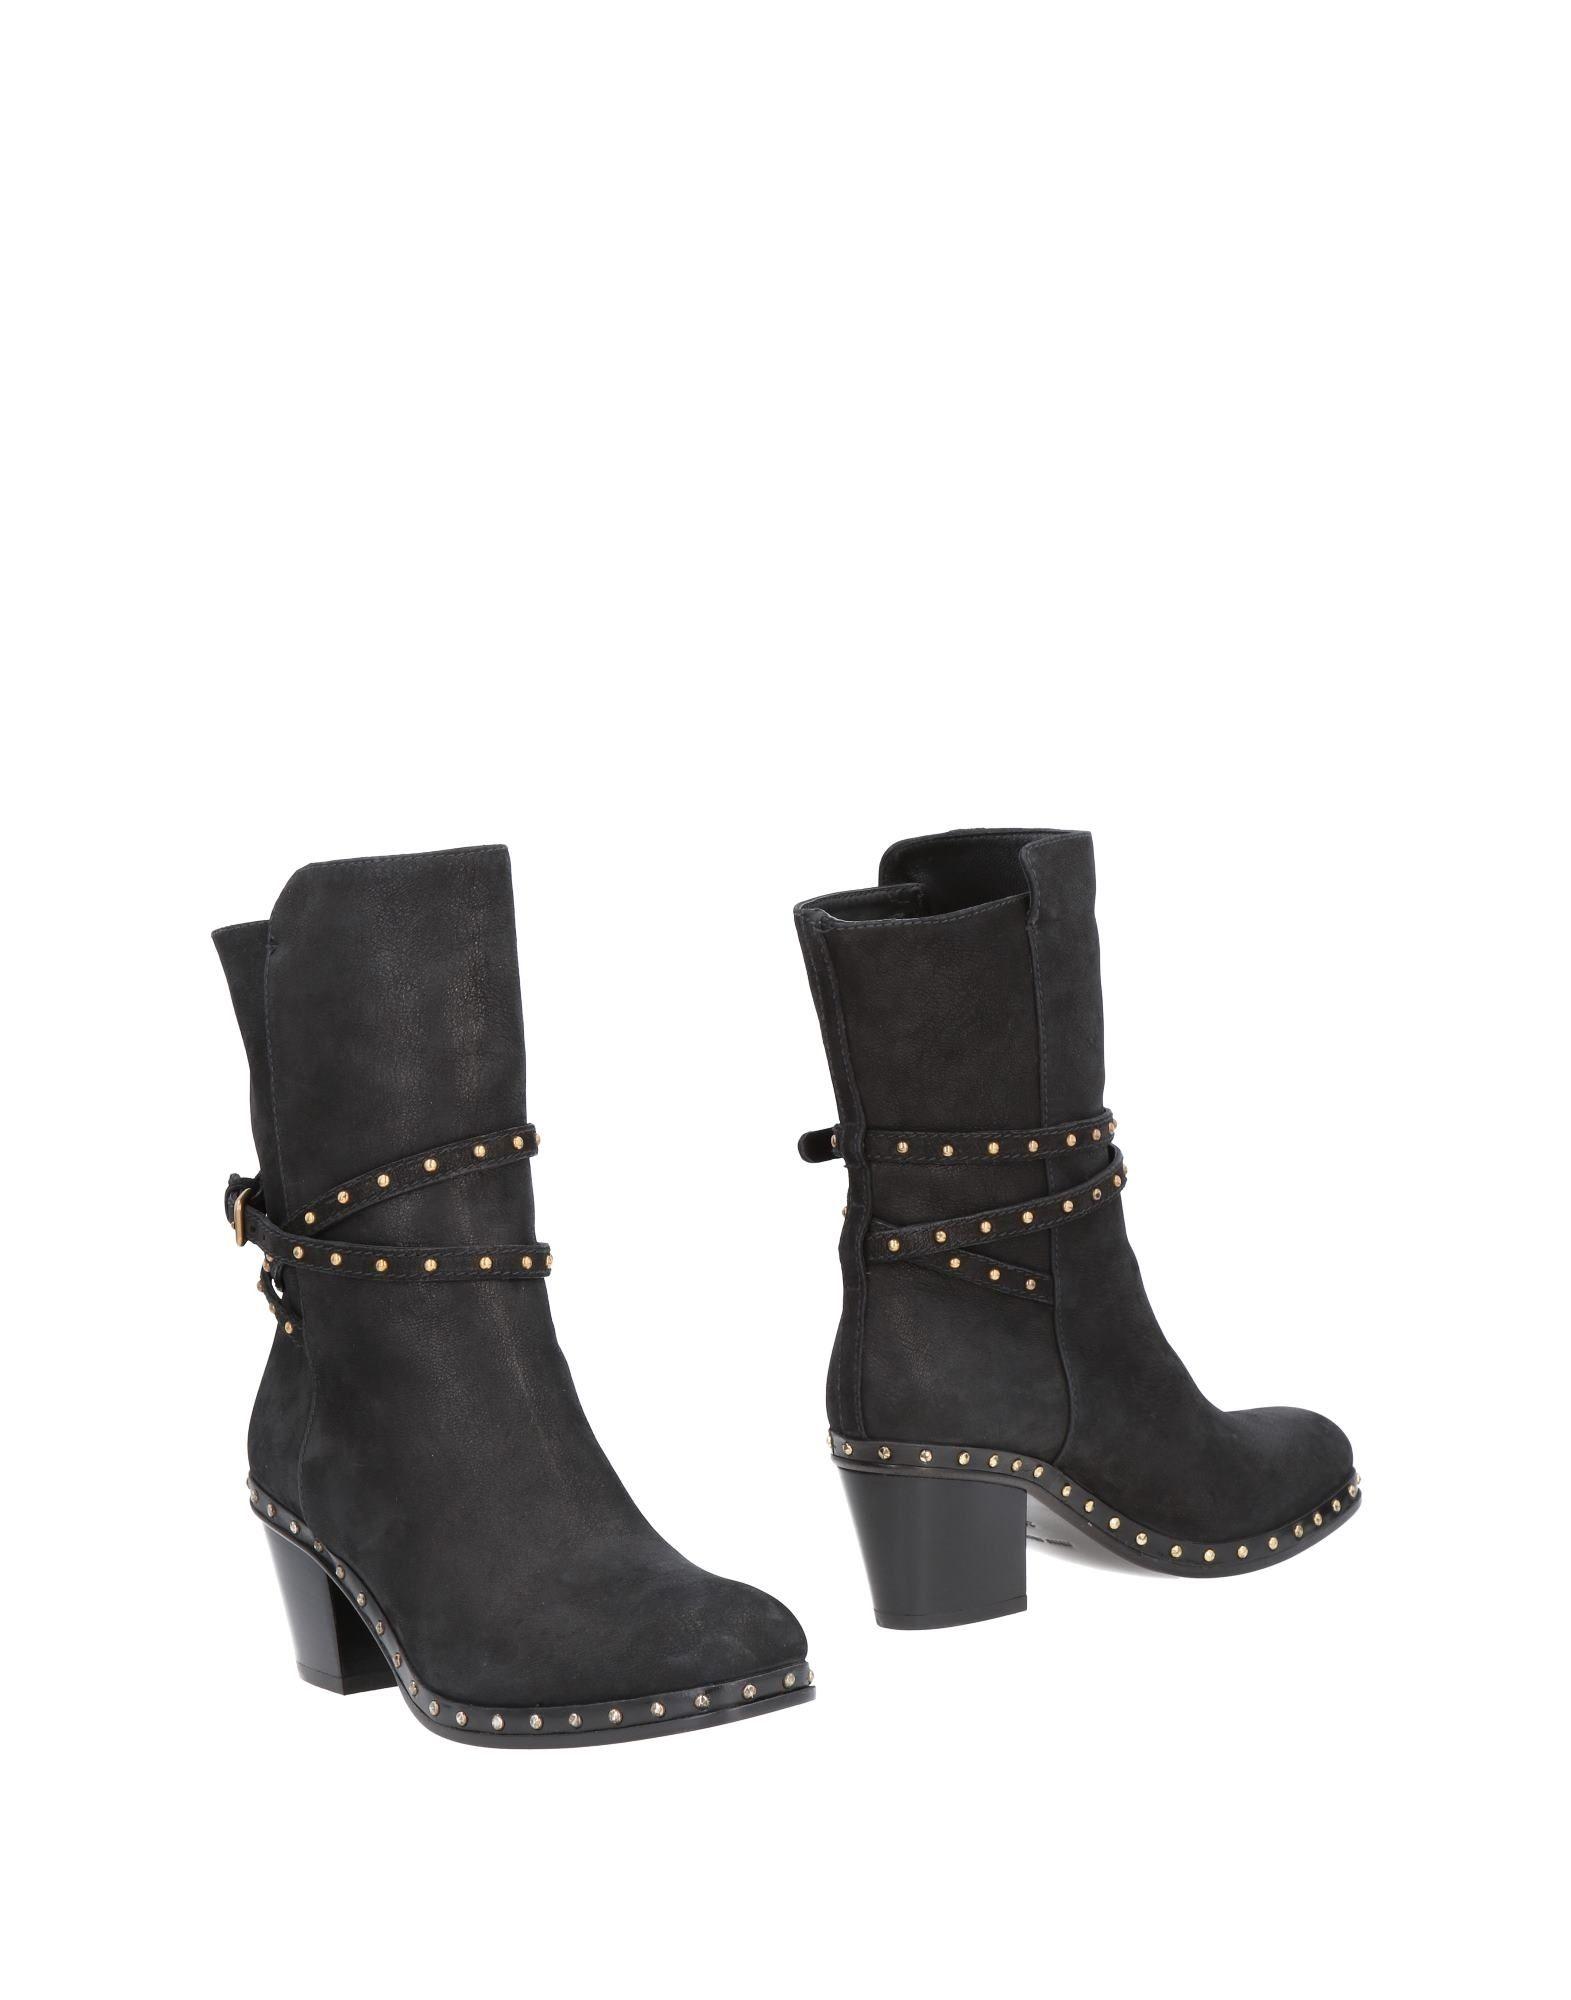 Miu Miu Stiefelette Damen  gut 11498921BIGünstige gut  aussehende Schuhe a41be4